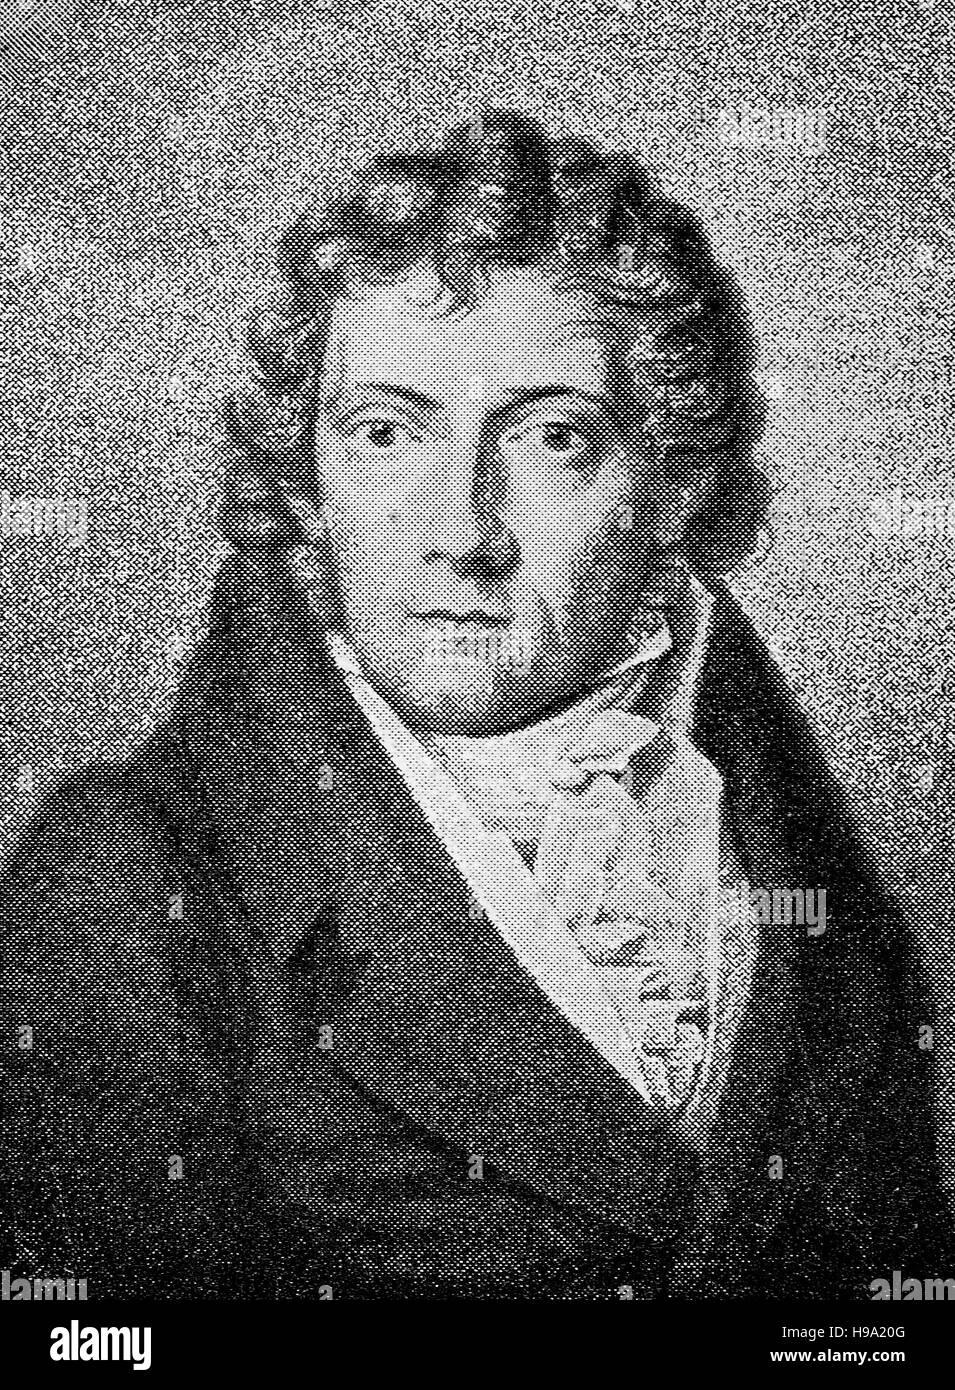 Friedrich Daniel Ernst Schleiermacher, November 21, 1768 - February 12, 1834 was a German theologian, philosopher, - Stock Image